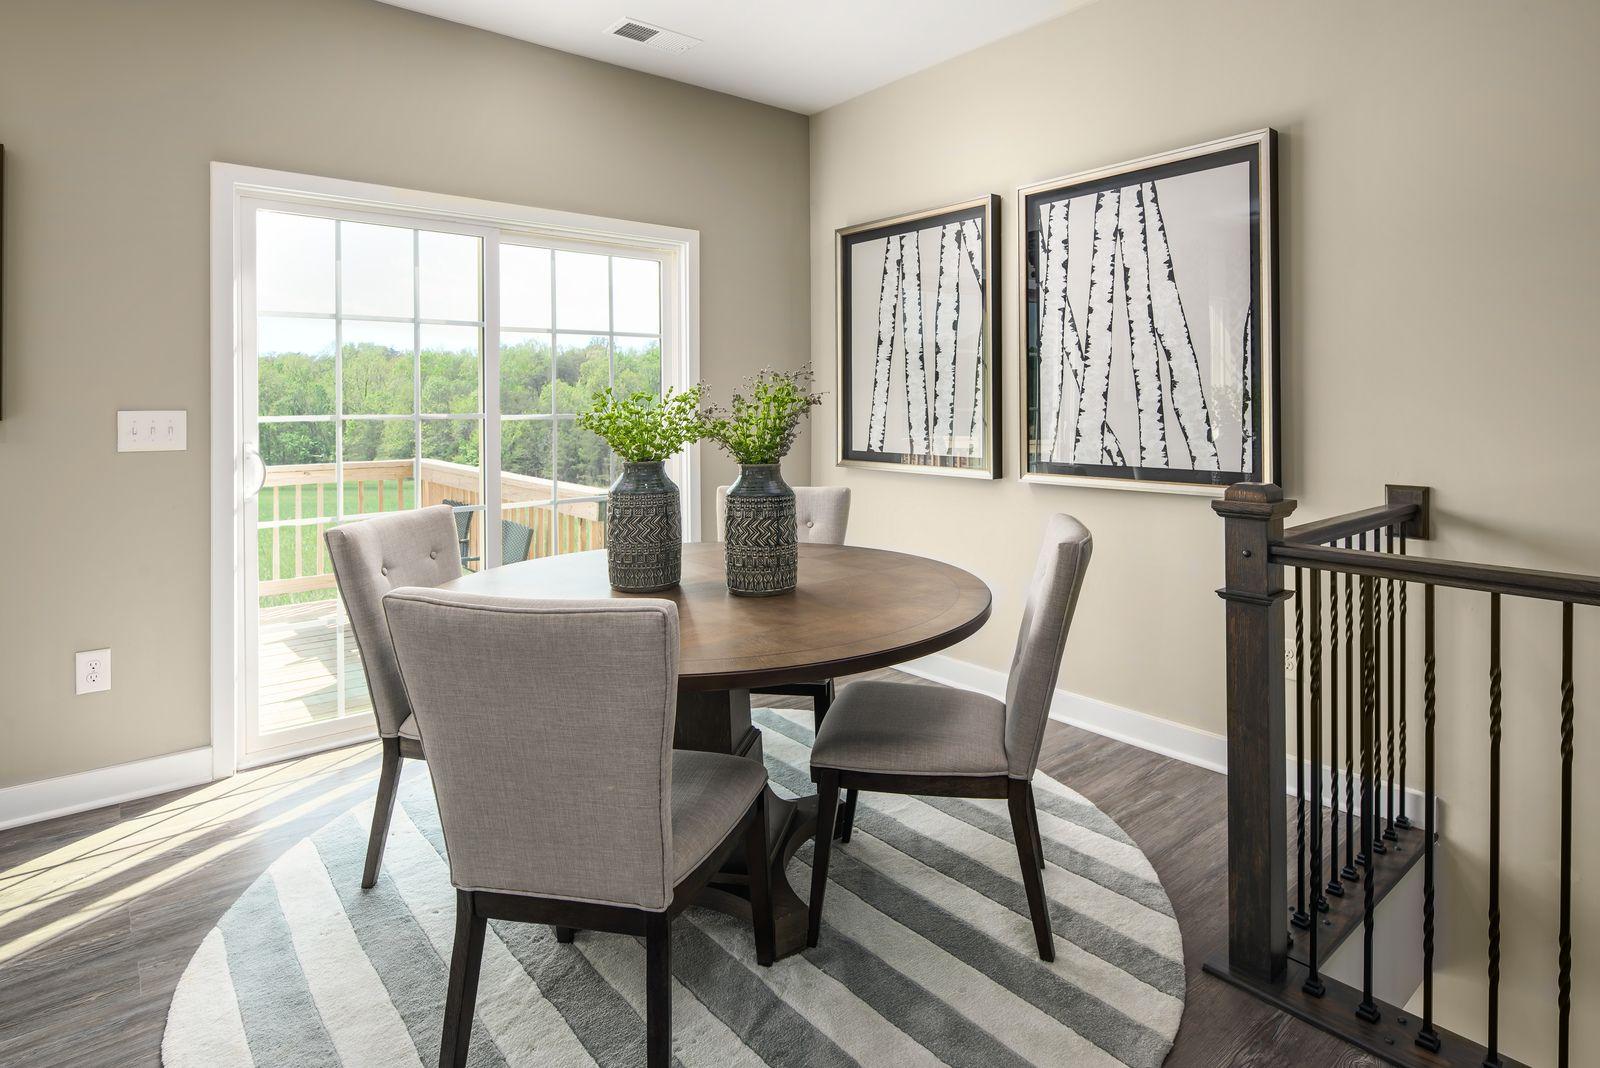 Kitchen featured in the Mendelssohn By Ryan Homes in Washington, VA